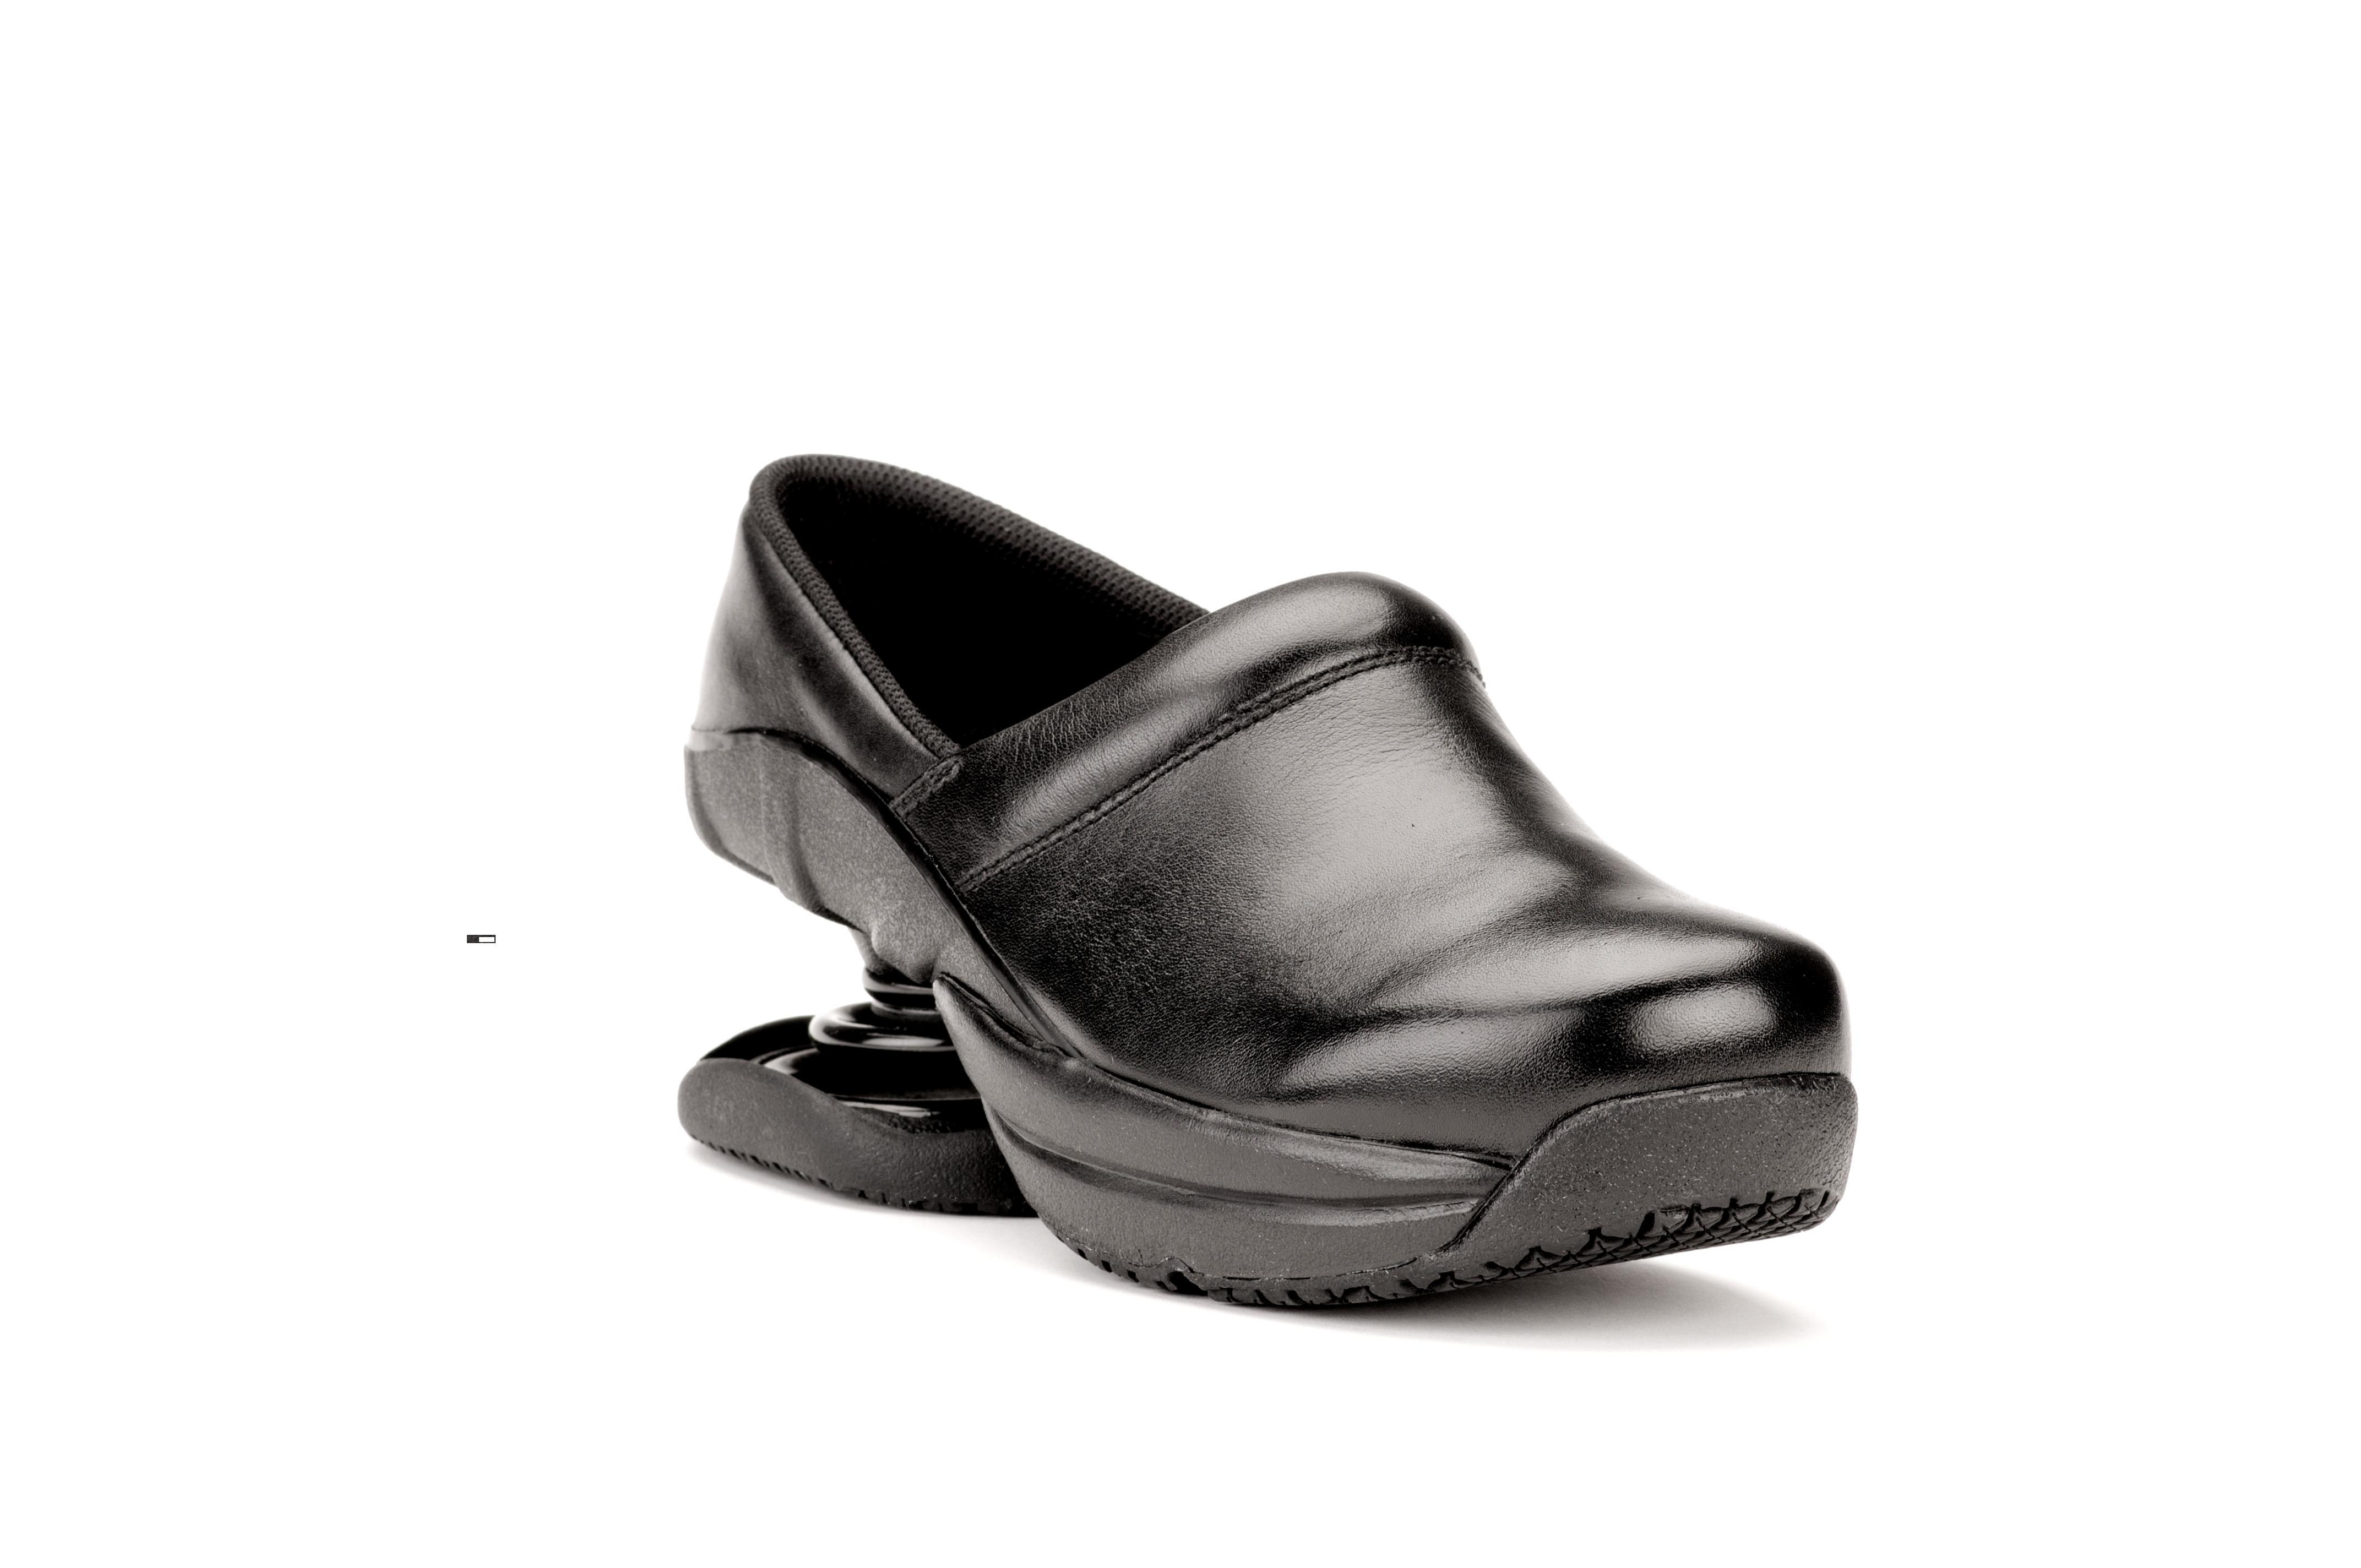 blackberry on shoes aetrex water comforter kimber worldwide main slip orthotic comfortable resistant